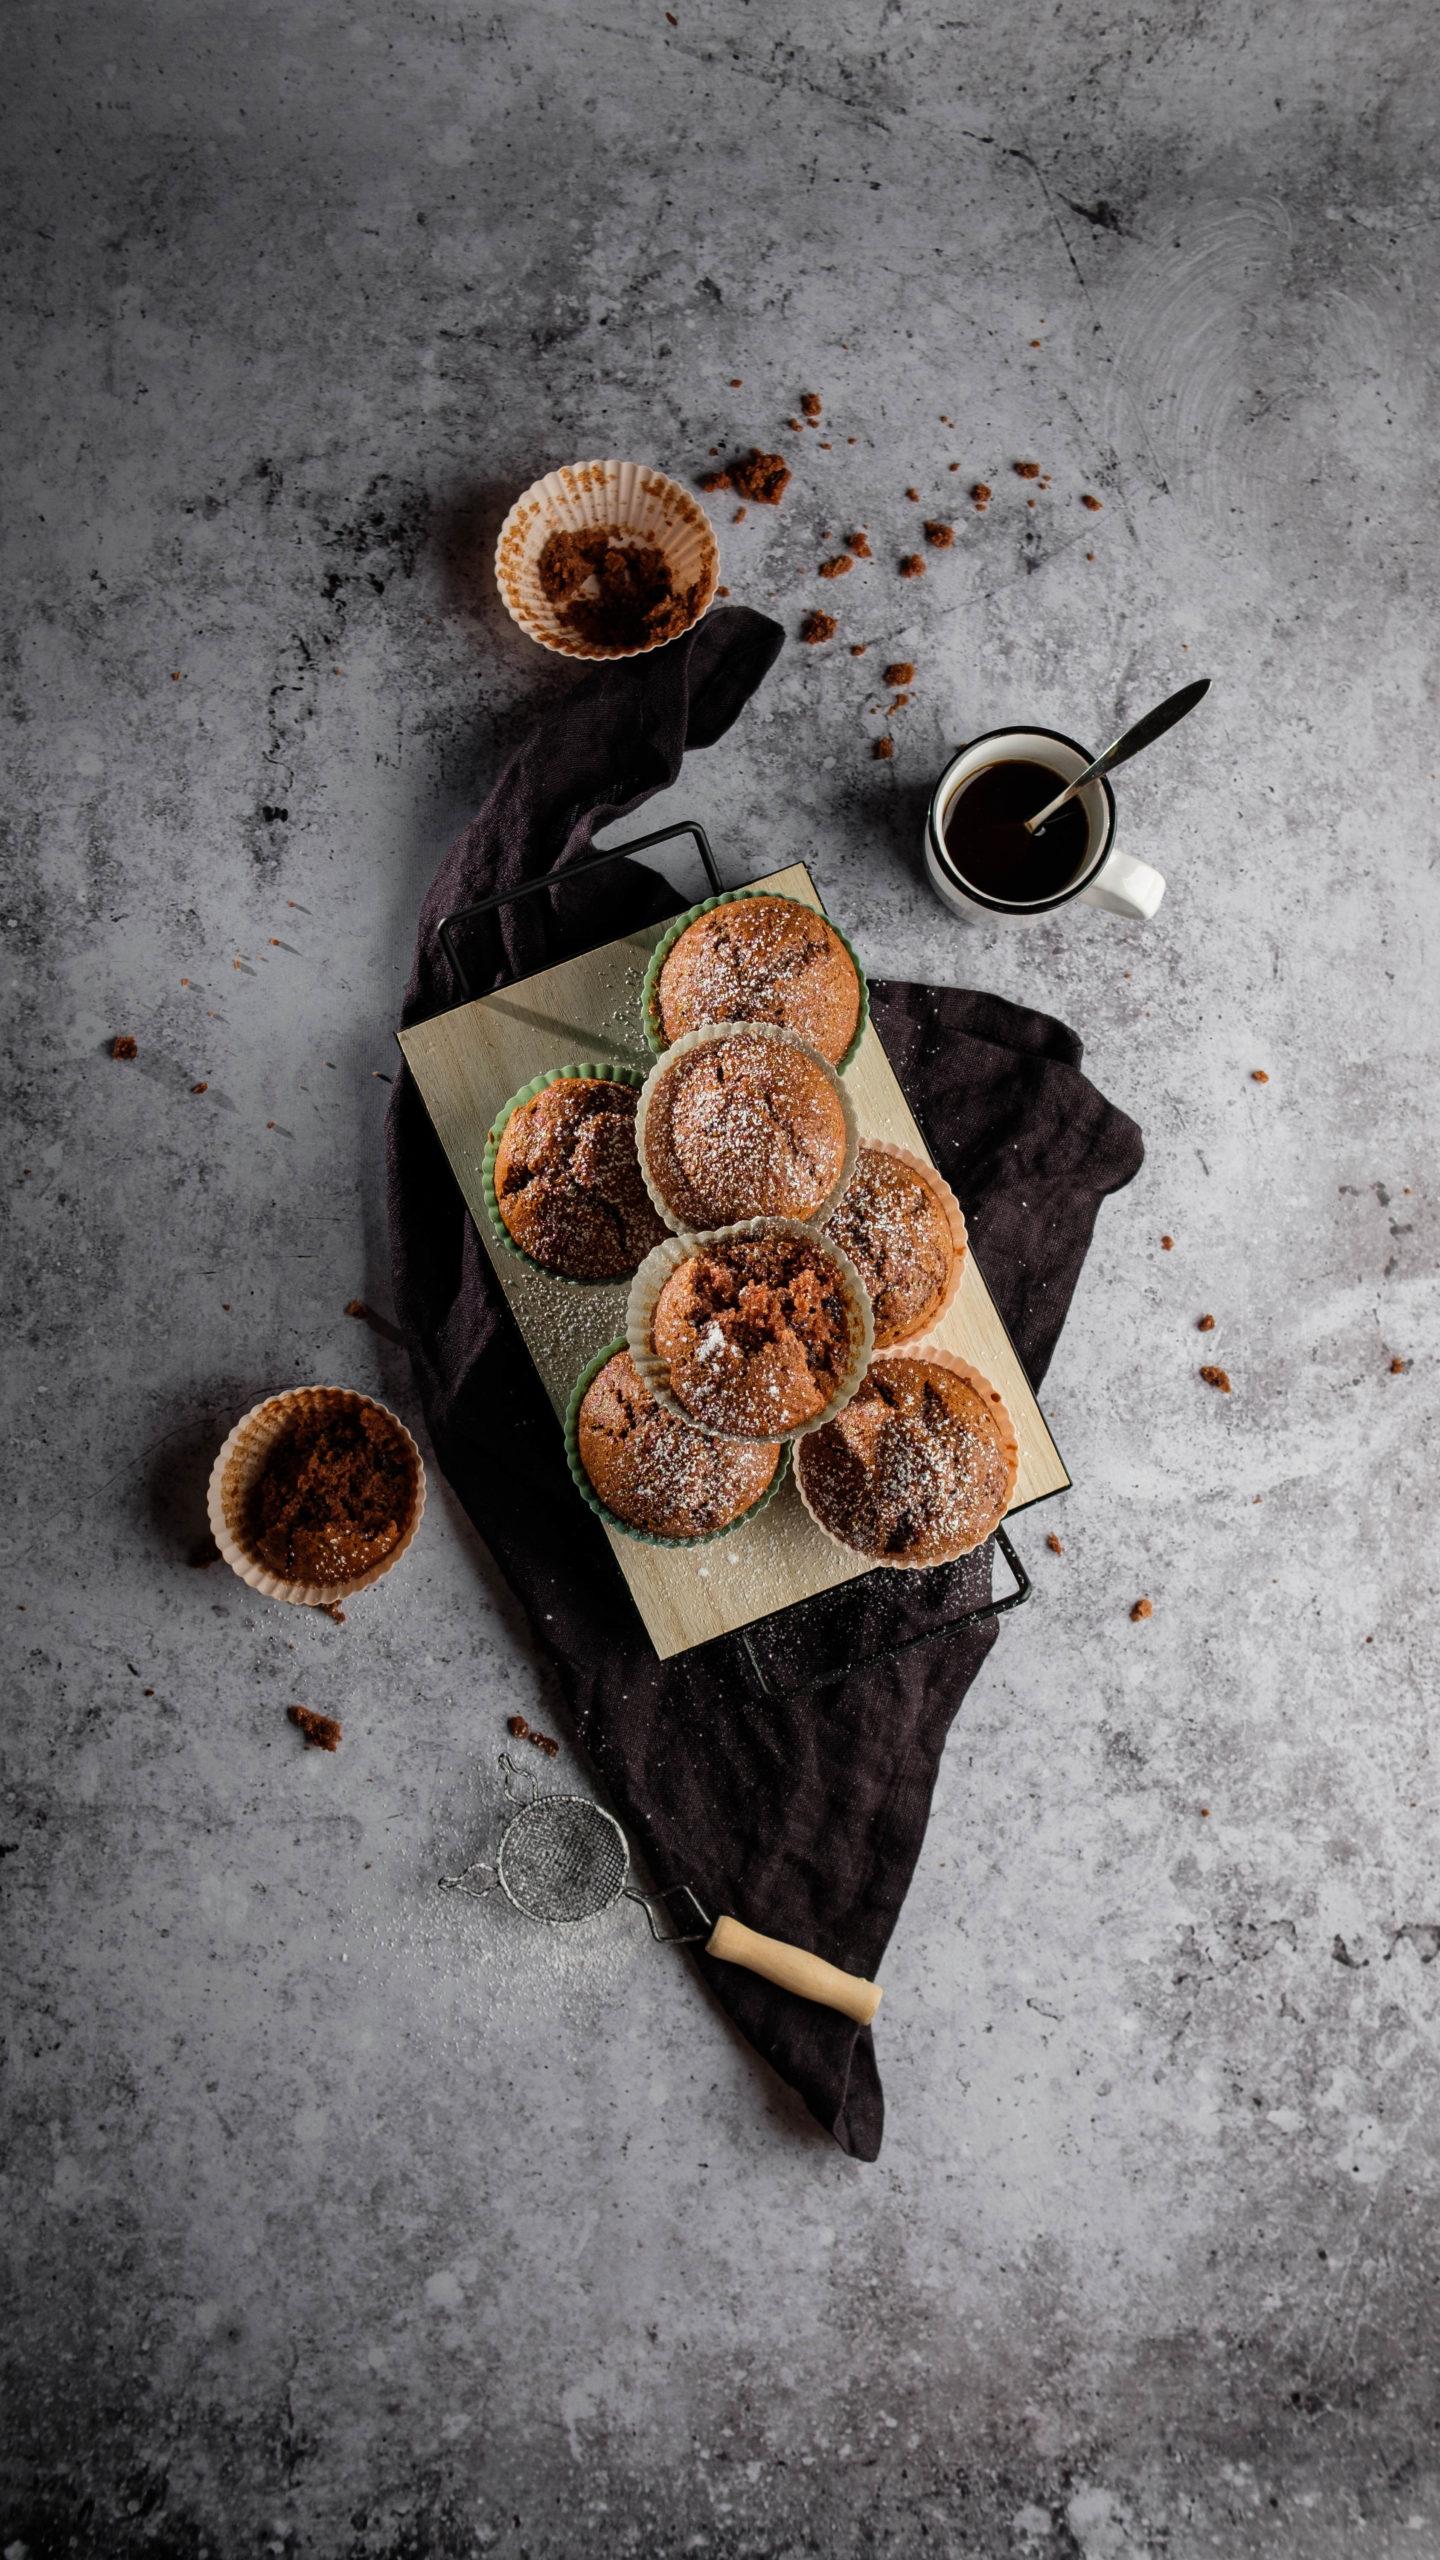 Schoko-Muffins, Schokomuffins, Muffins, vegane Muffins, vegane Schokomuffins, vegan, Rezept